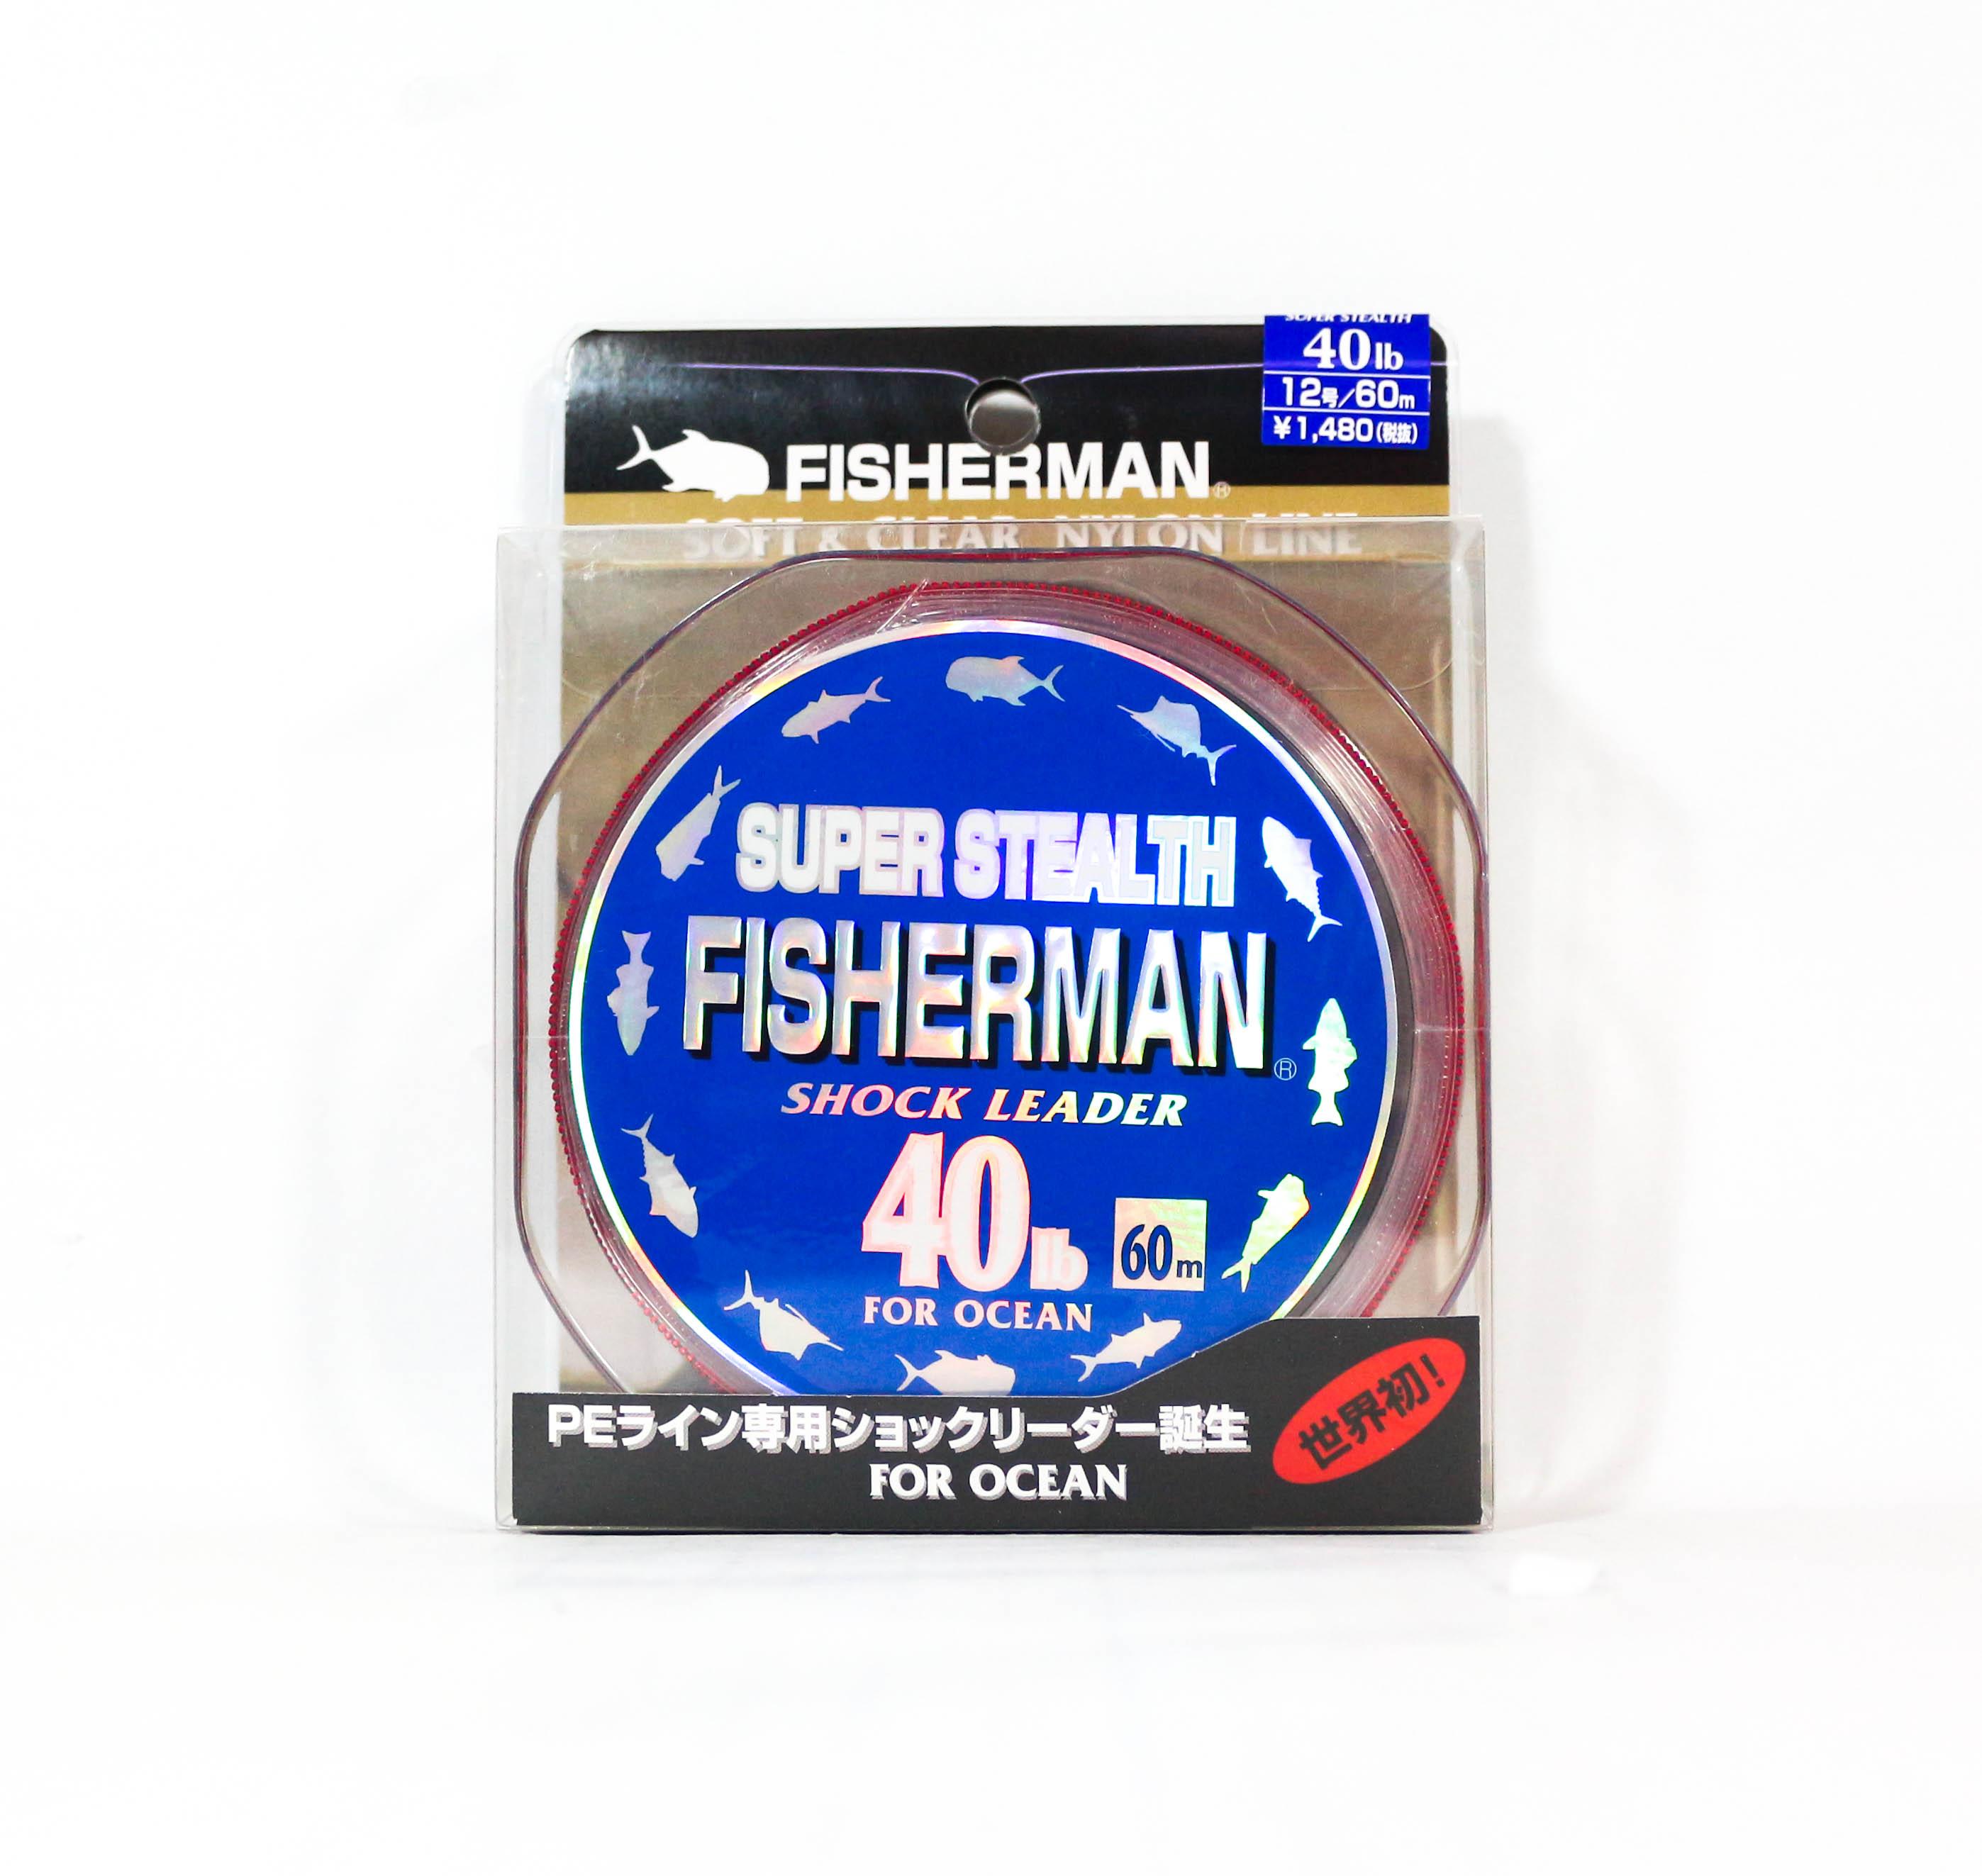 Fisherman Super Stealth Nylon Shock Leader 40 lb x 60 meter (0092)